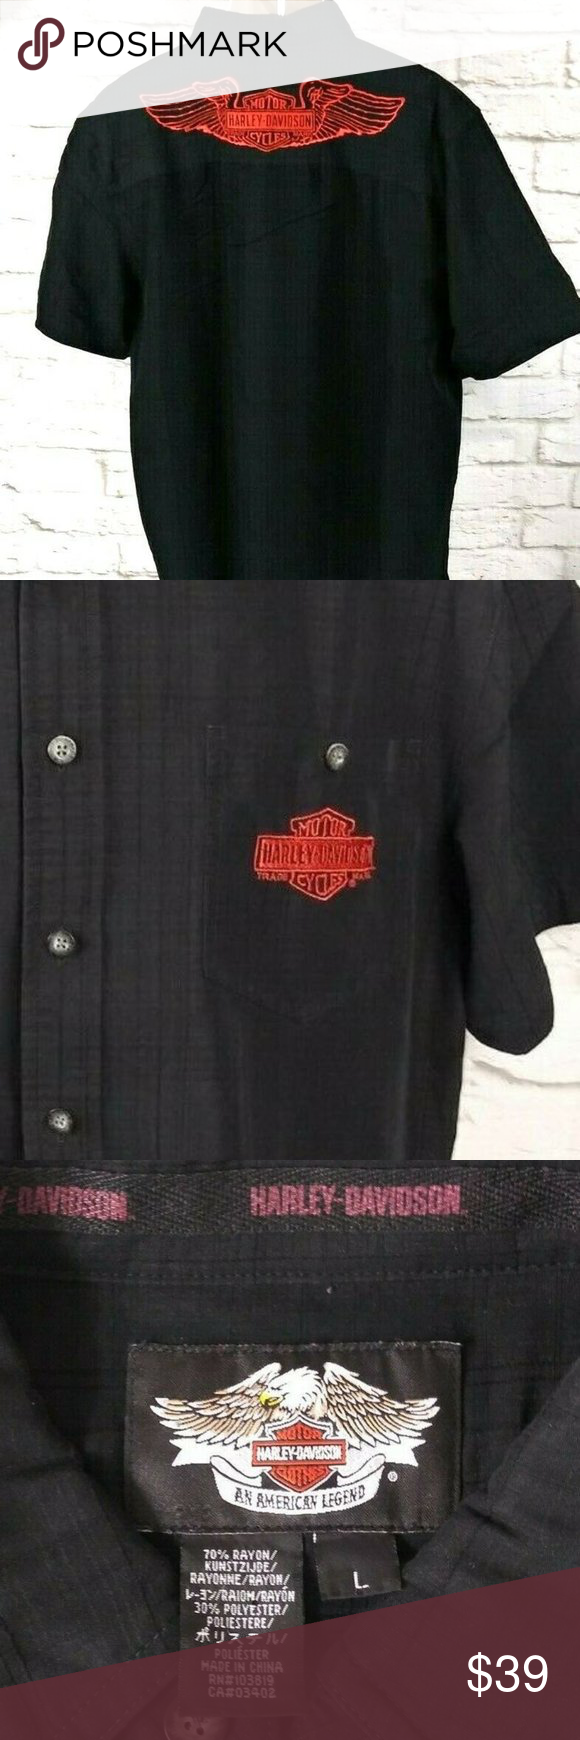 Harley Davidson Men's Shirt Large Harley Davidson Mens Black Shirt Large Embroidered Eagle Wings American Legend. Item is in great shape.                                                                    length from bottom of collar to hem: 30